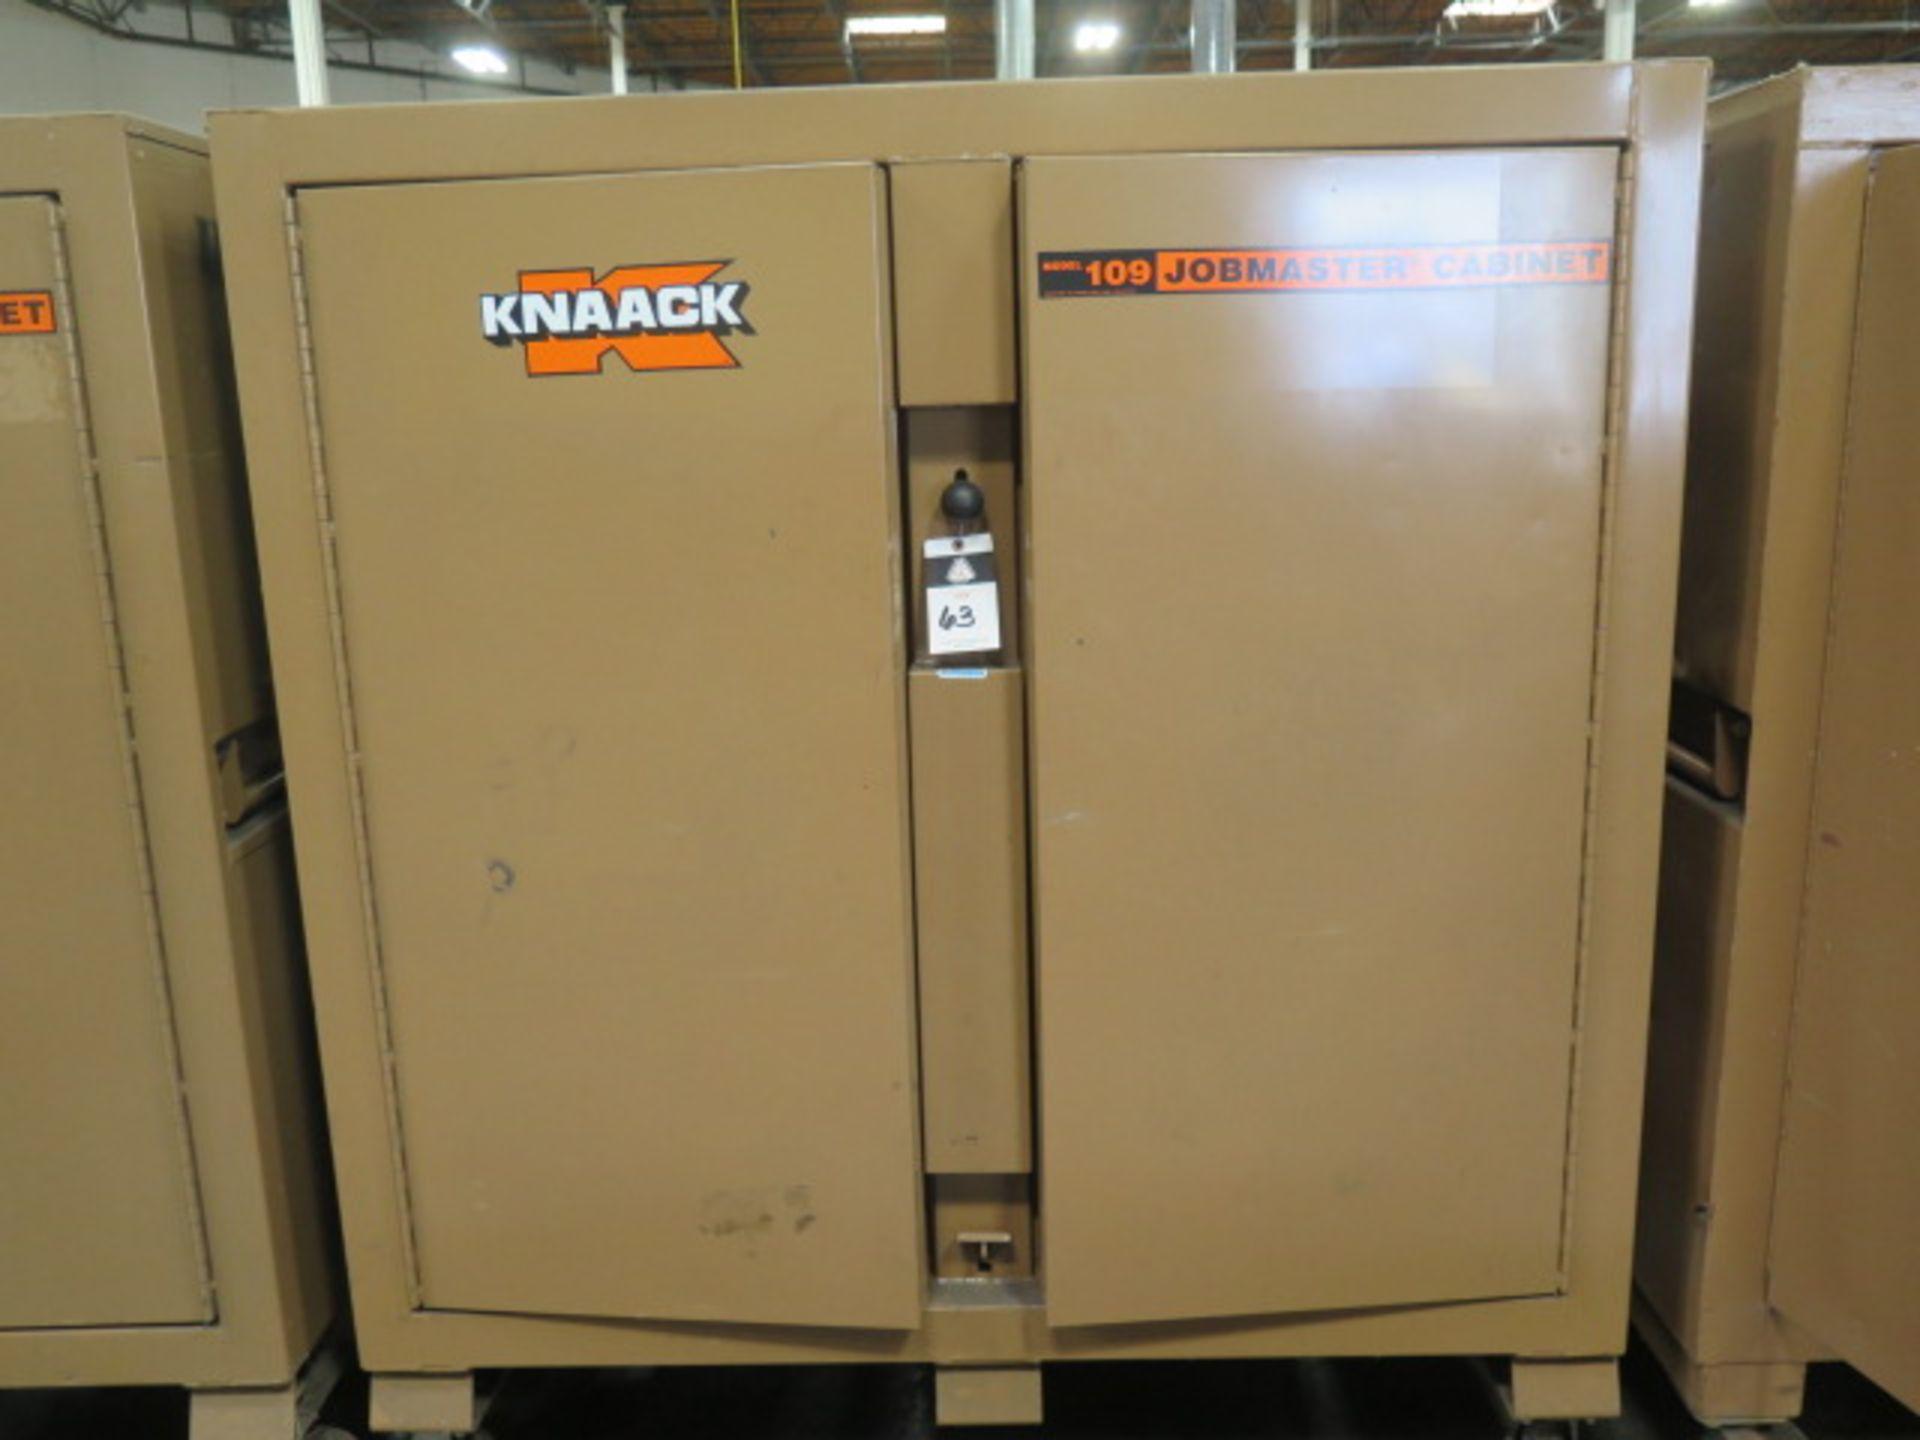 Welding Wire, Welding Guns and Misc Supplies w/ Knaack mdl. 109 Jobmaster Rolling Job Box (SOLD AS-